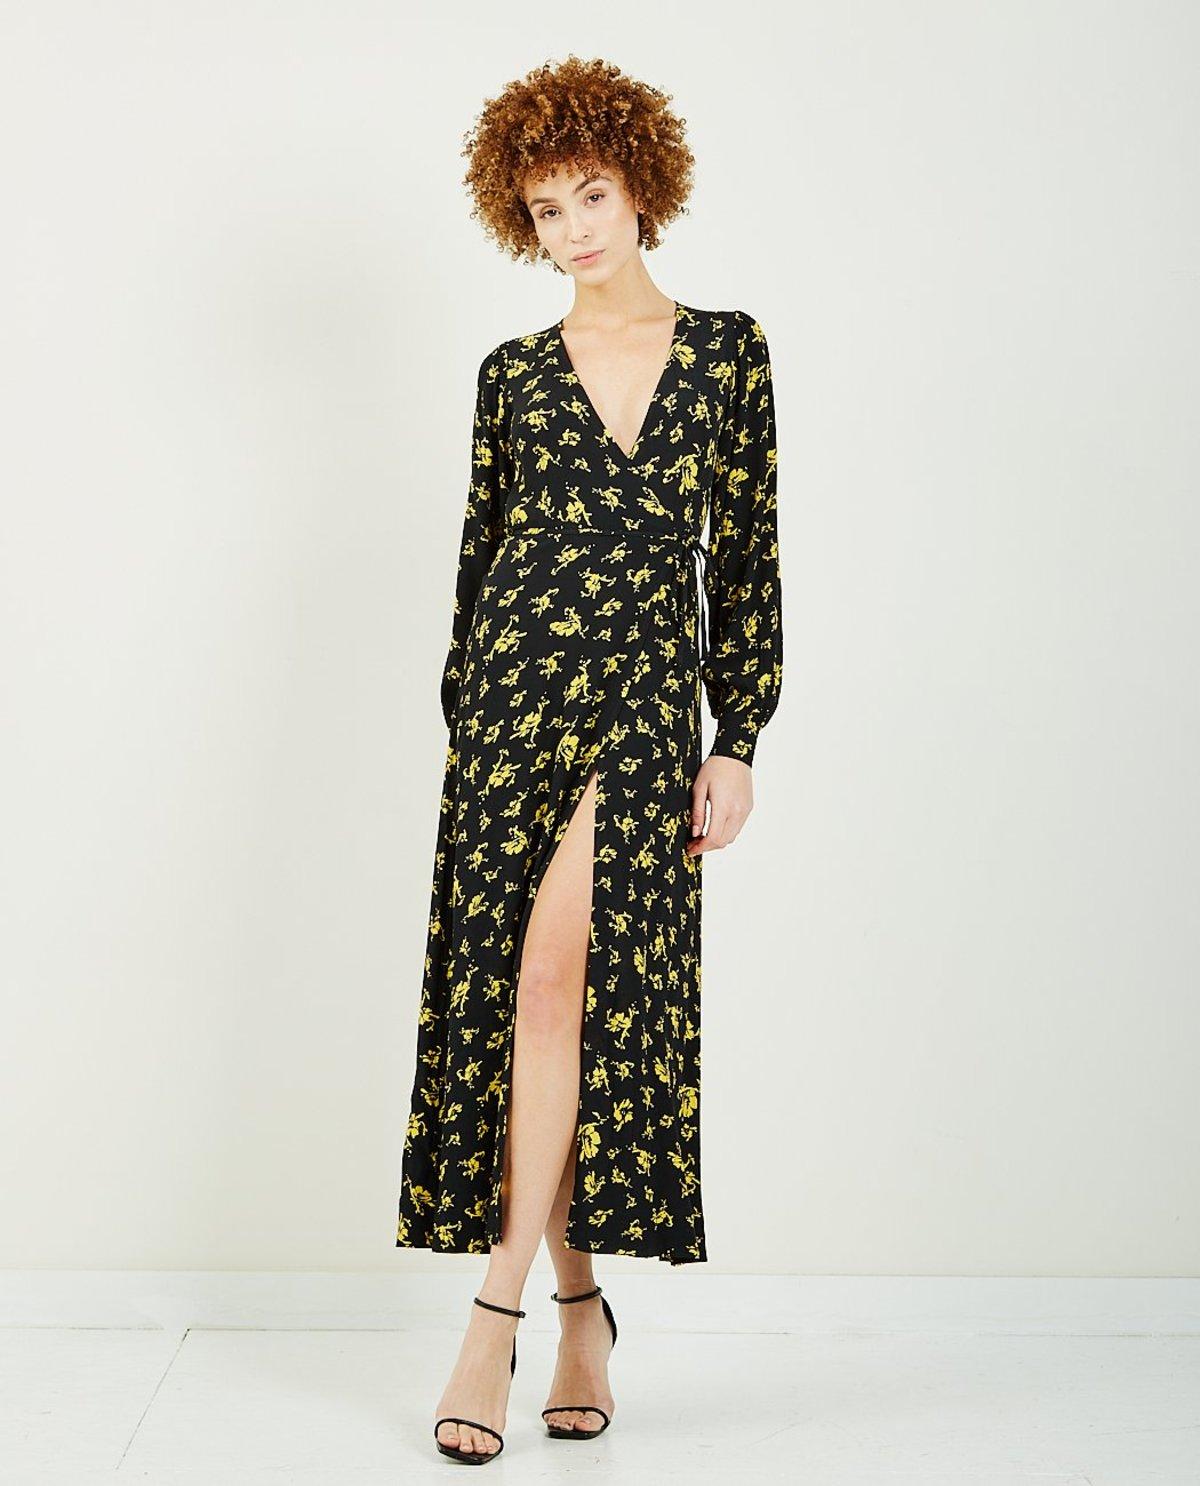 Ganni Printed Crepe Wrap Dress Black Yellow Garmentory